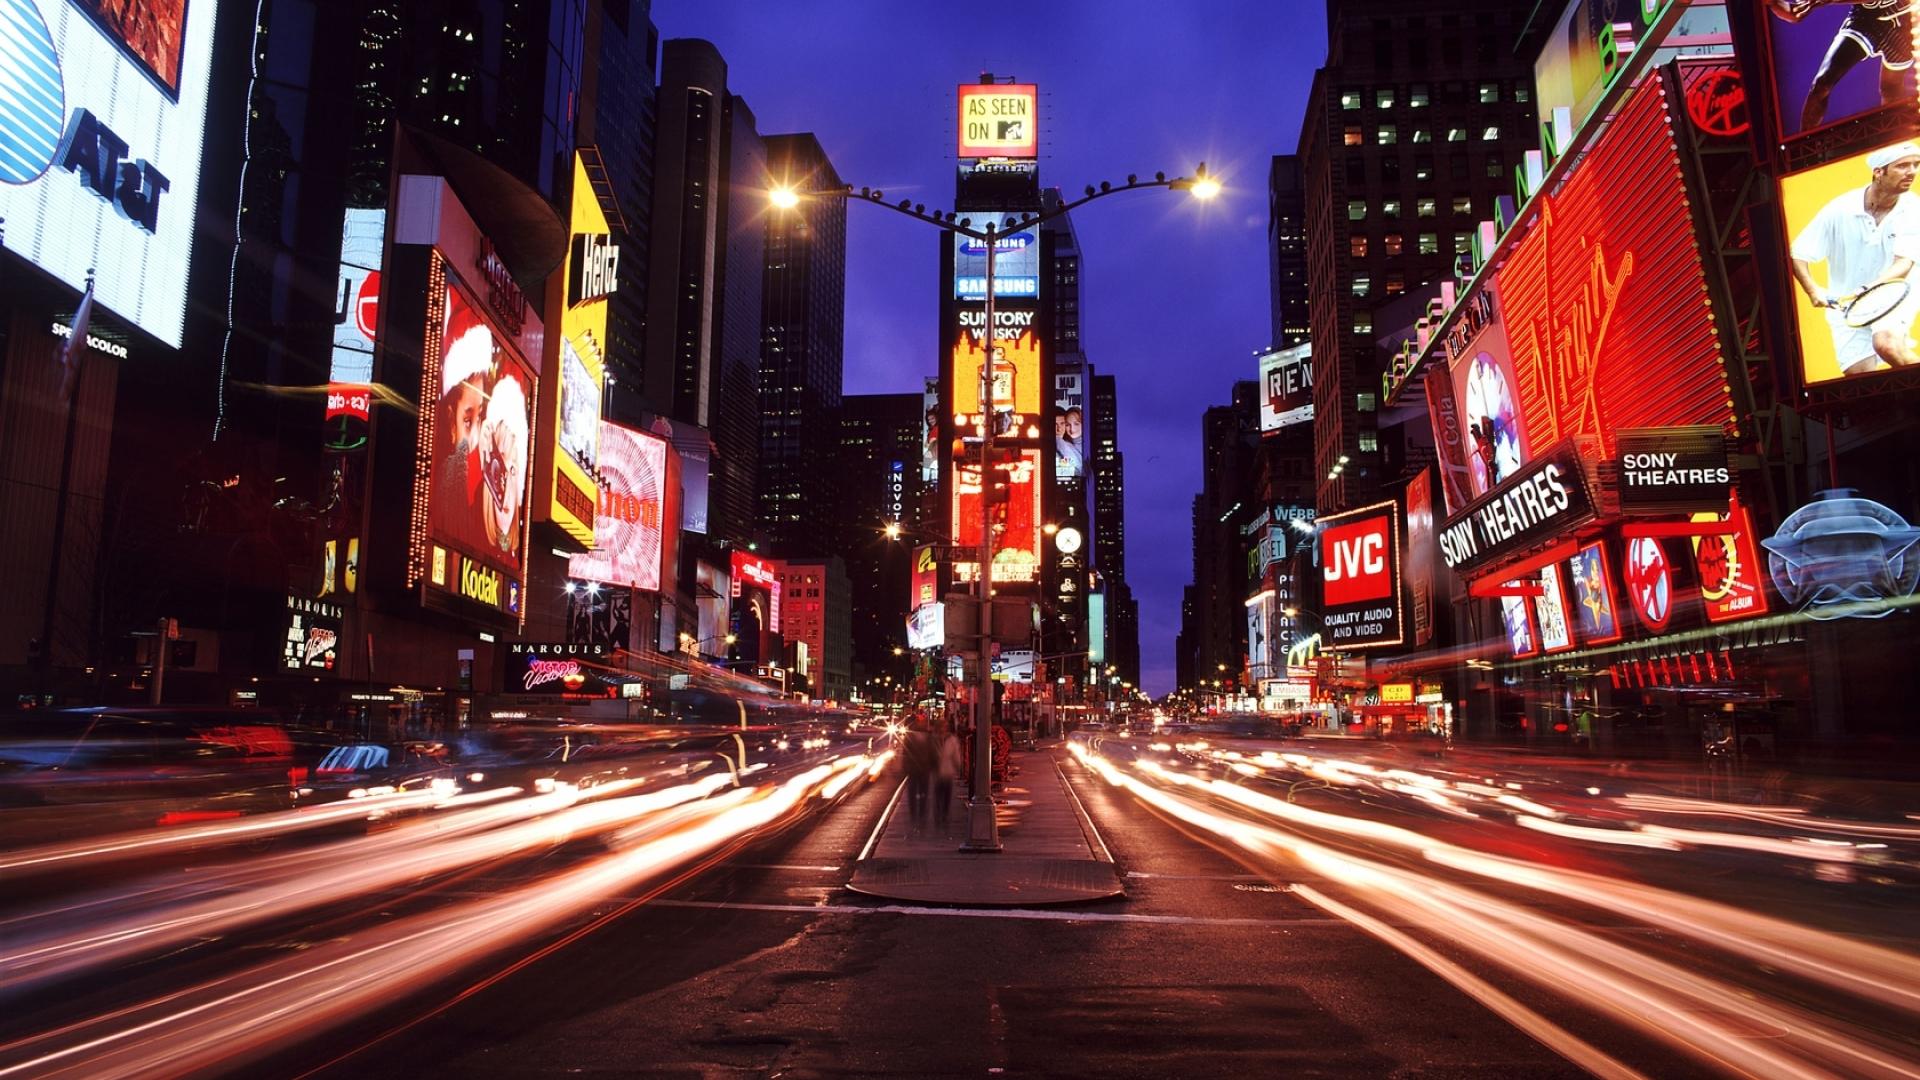 1920x1080 New York Times Square Night City 1080p Laptop Full Hd